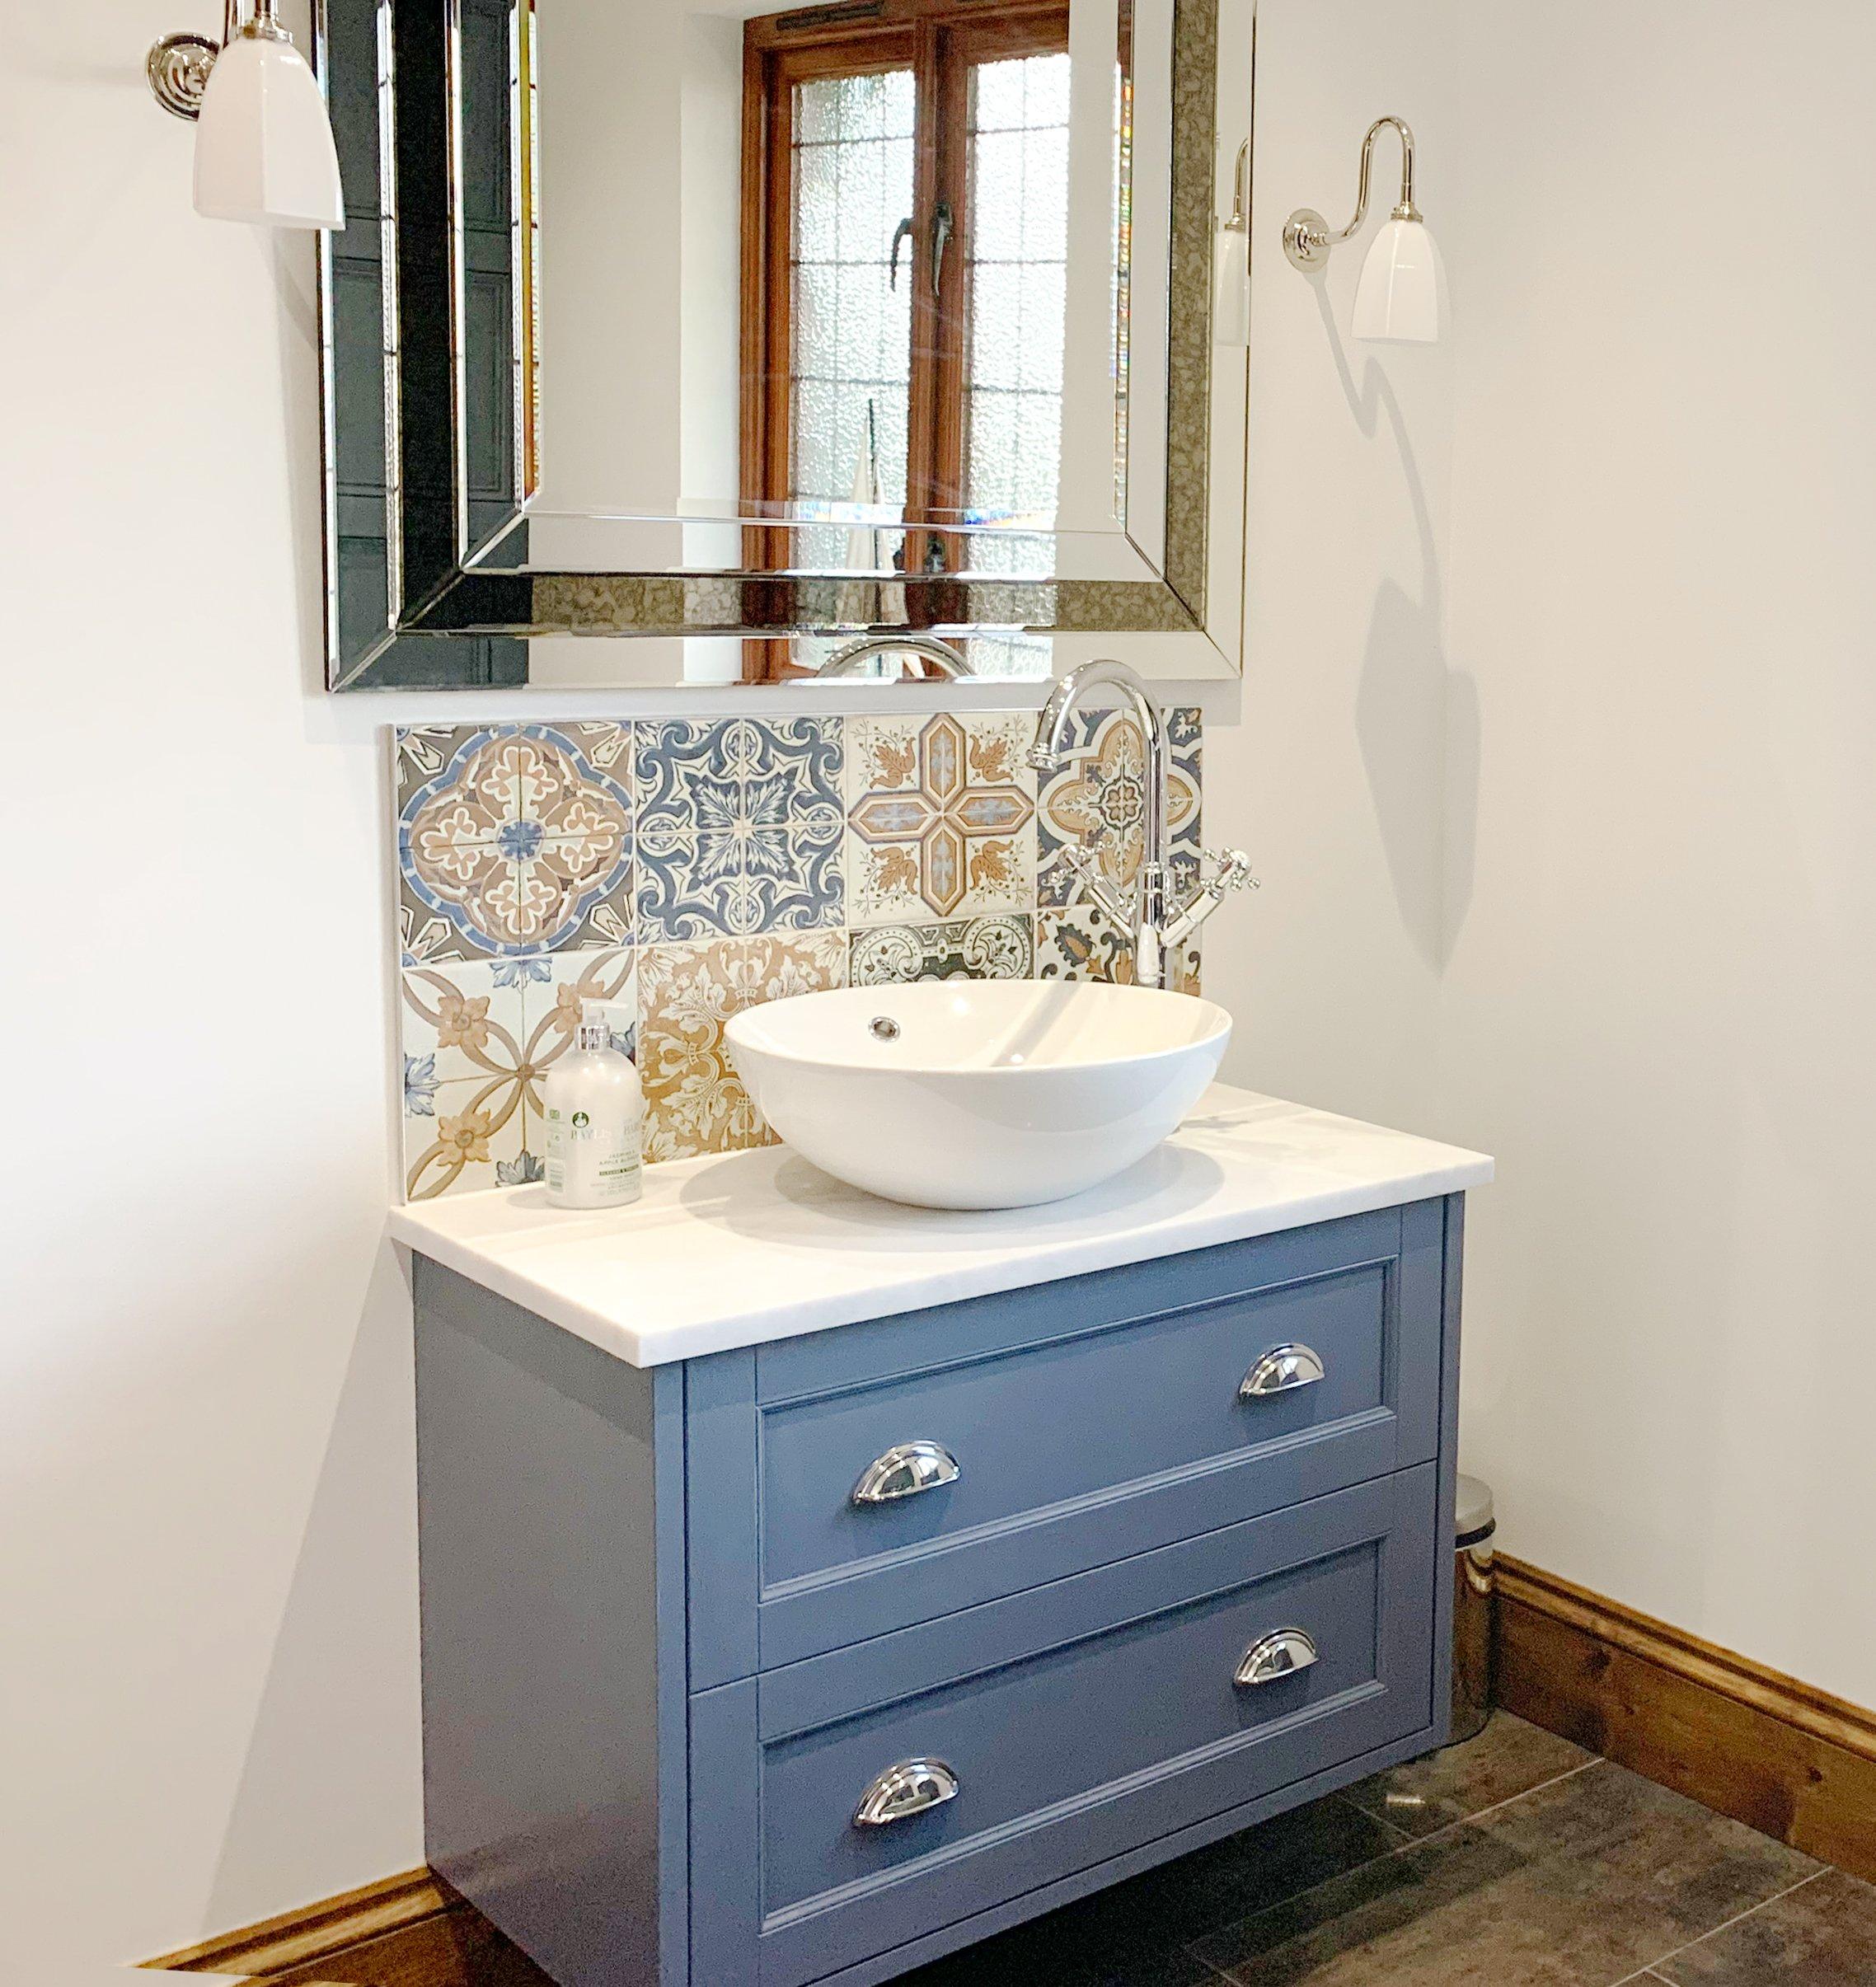 Duravit-Sink-Vanity-Hall-Bathroom-Furniture